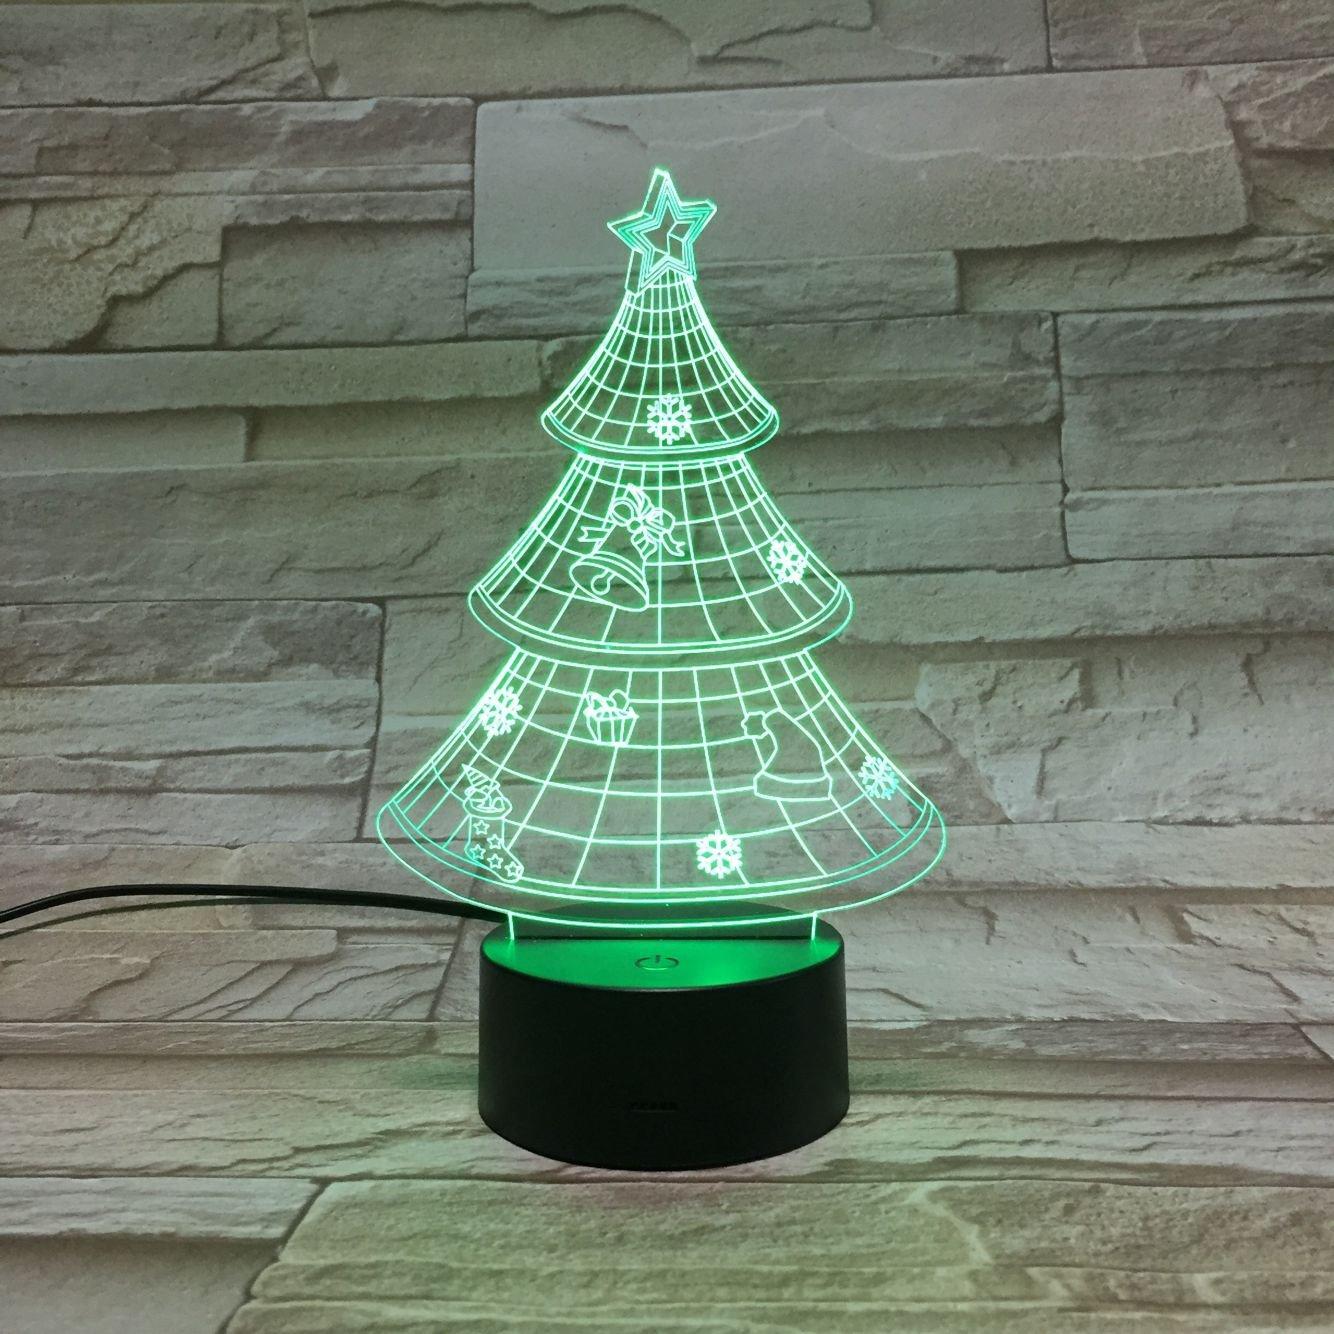 3D ナイトライト B072K3B73N 10609 クリスマスツリー クリスマスツリー